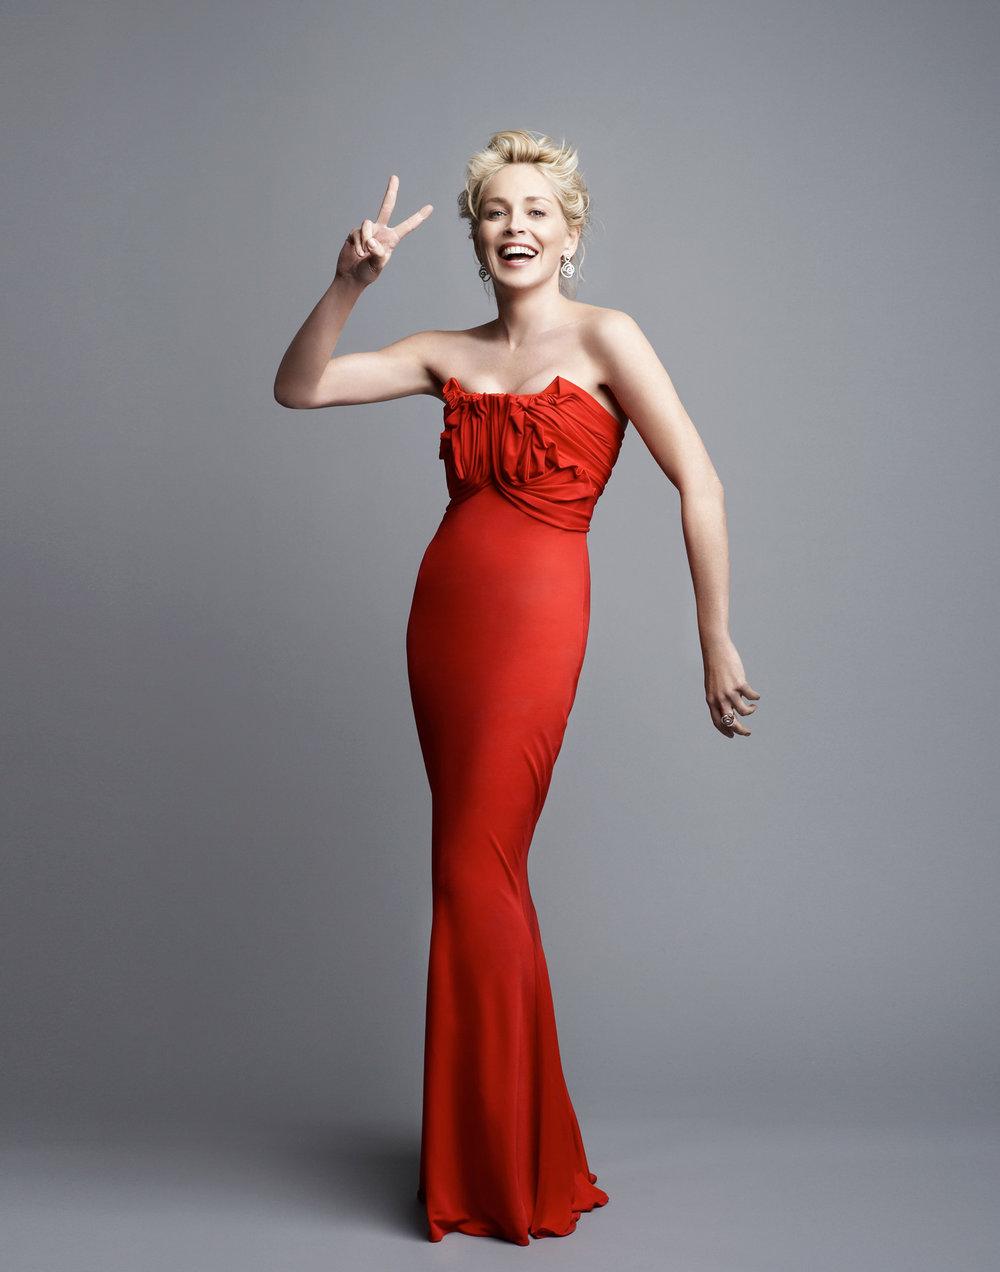 BAFTA Sharon Stone